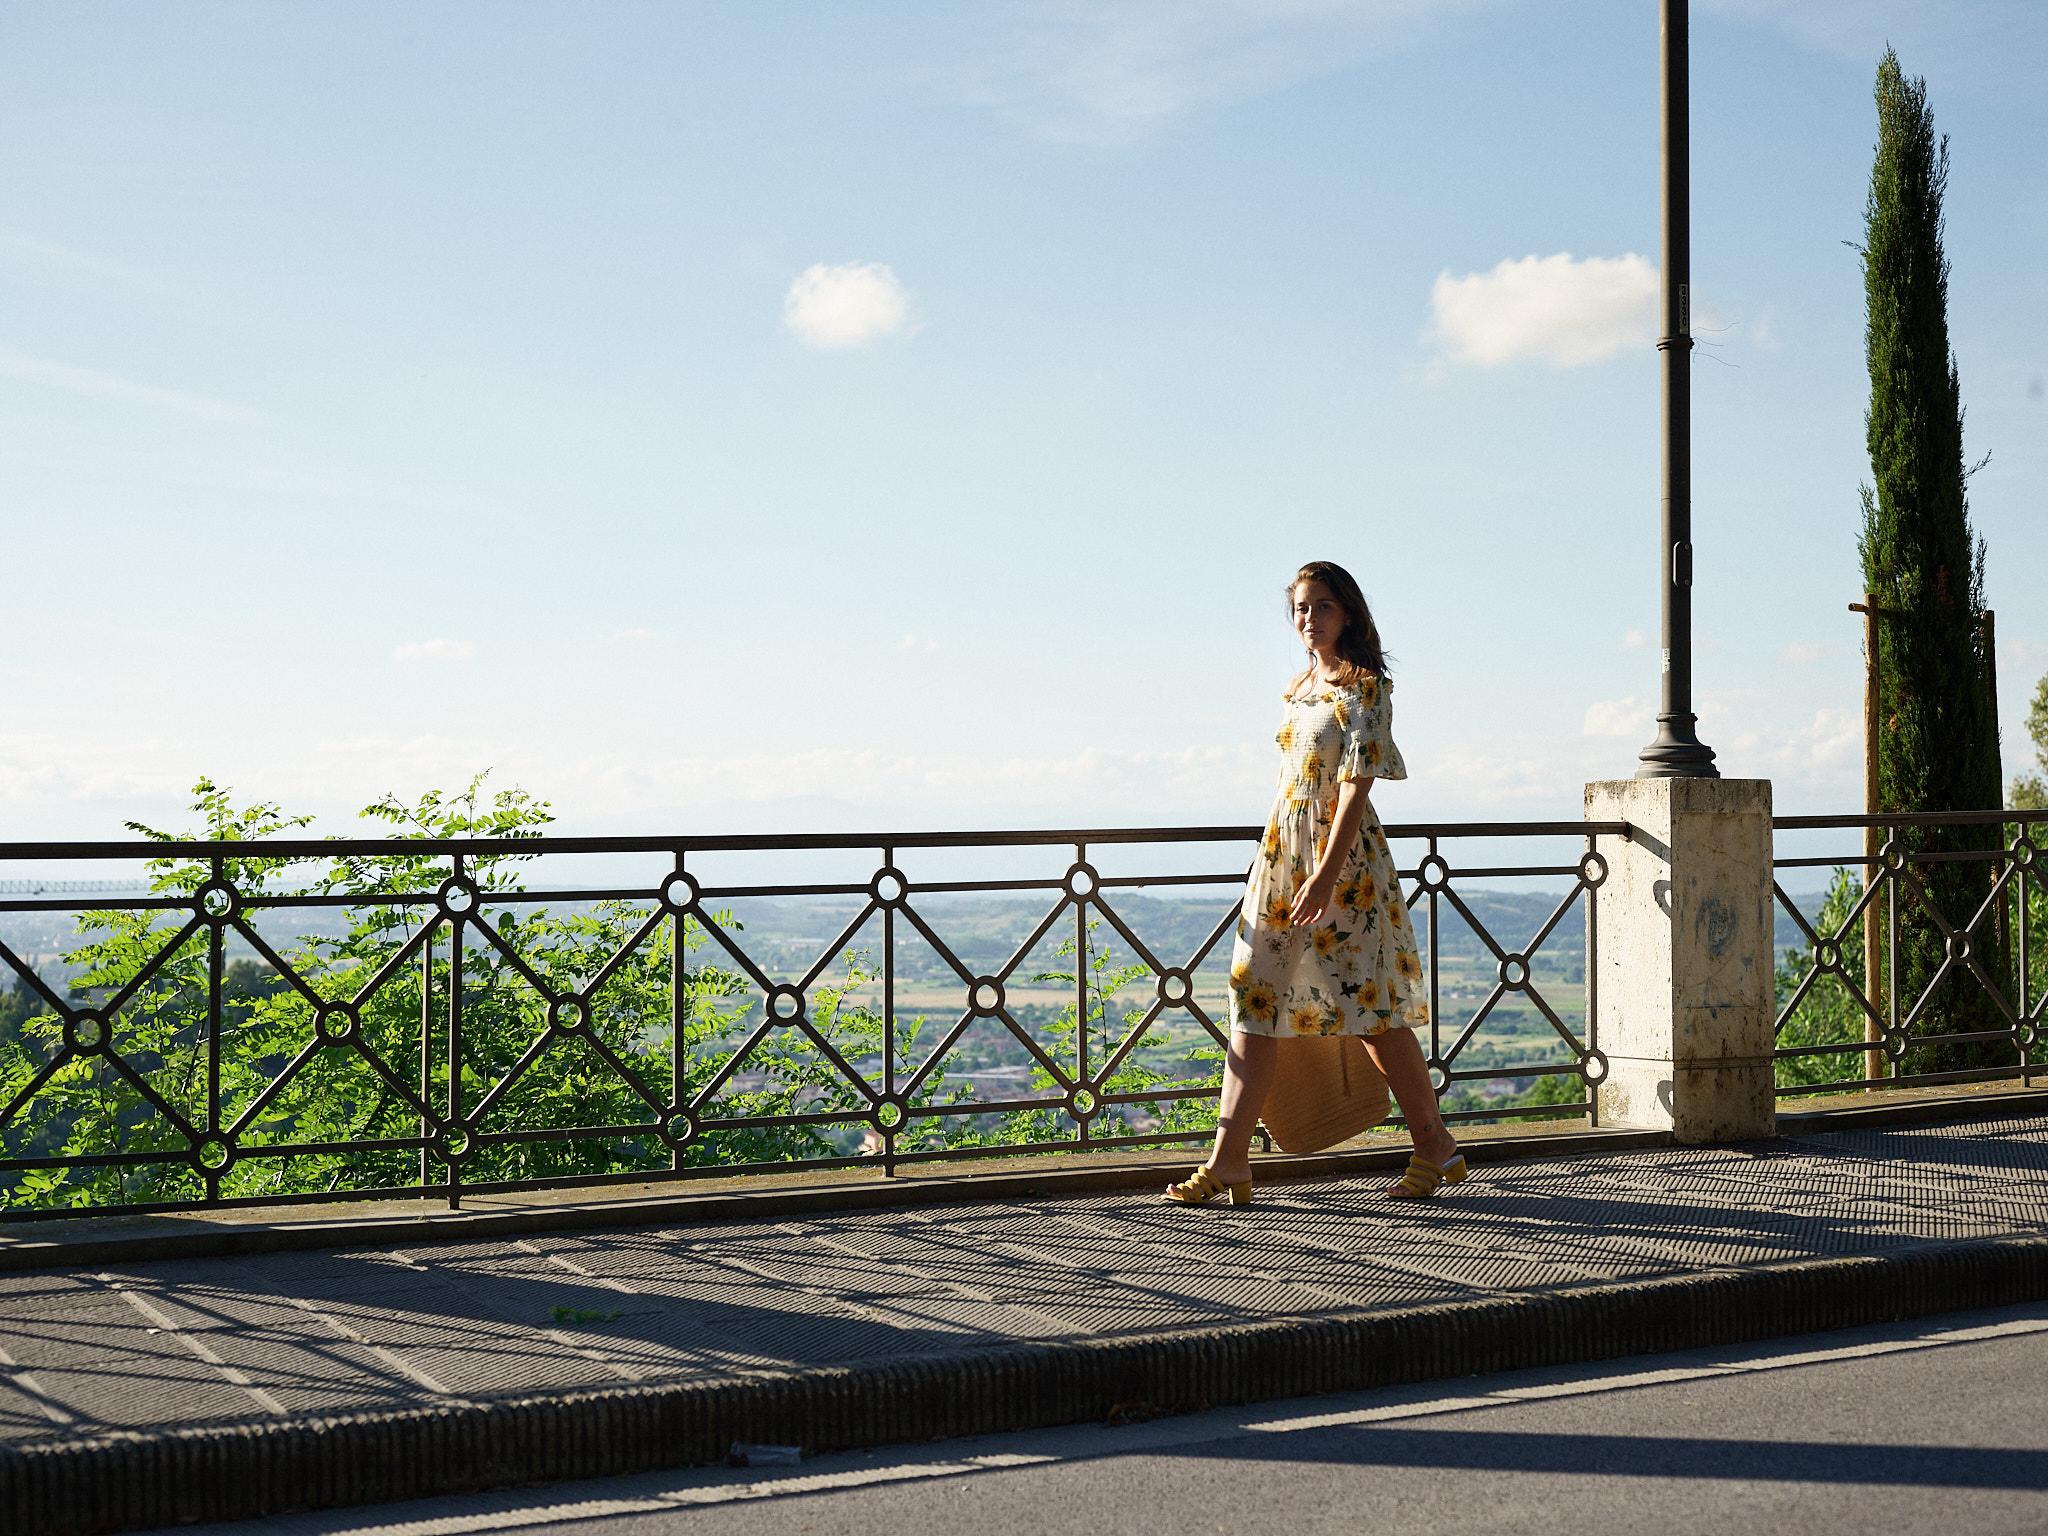 Deodoc-Toscana-Nicole-01.jpg